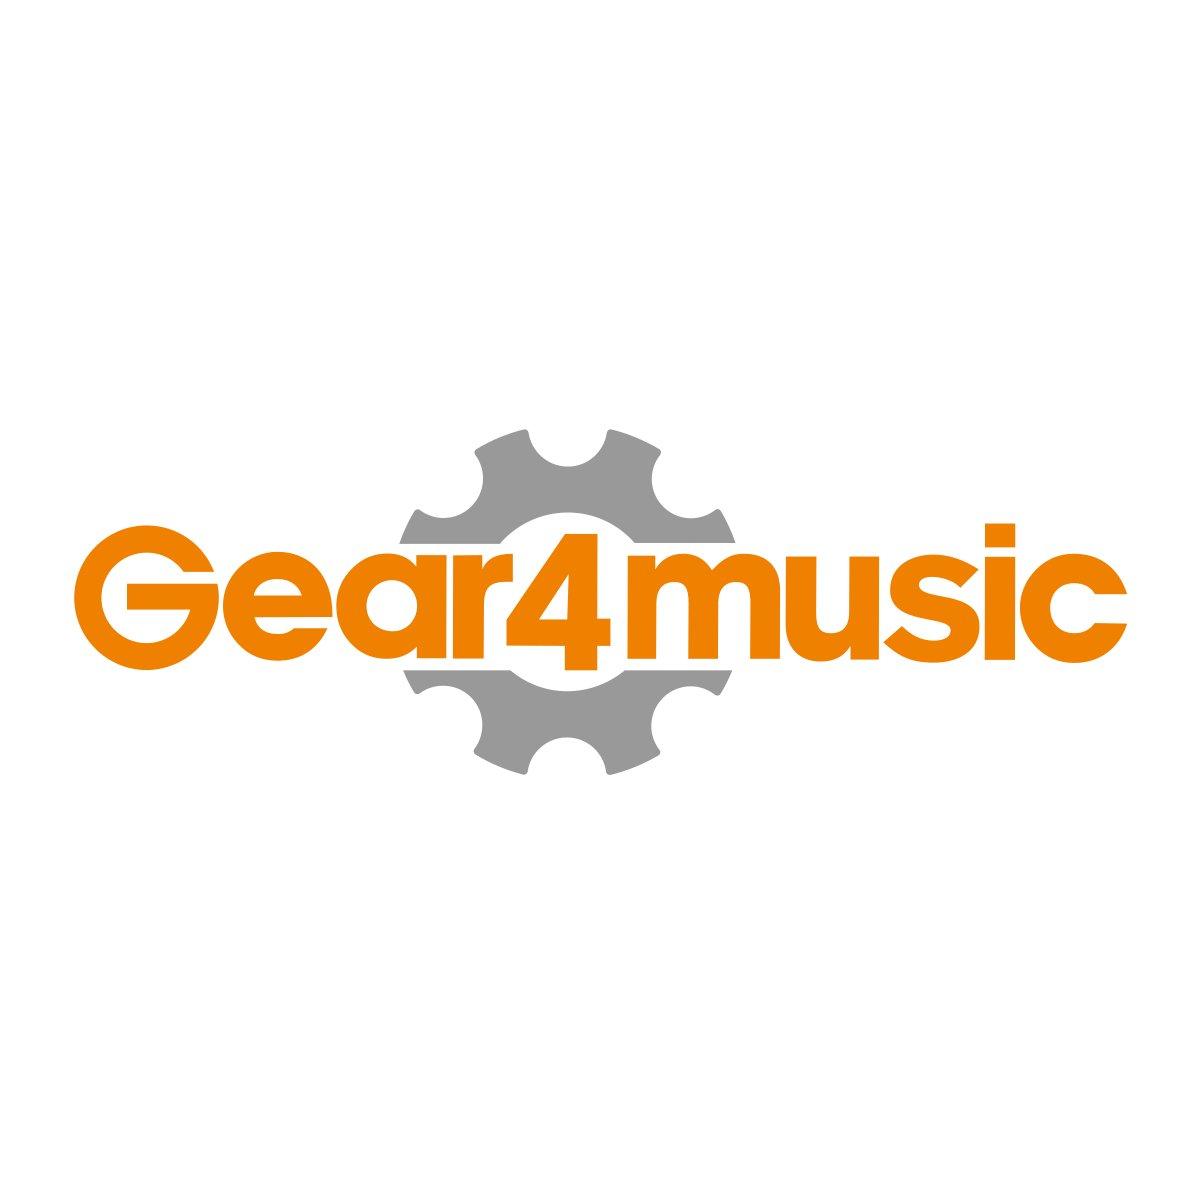 Piano stool gear4music